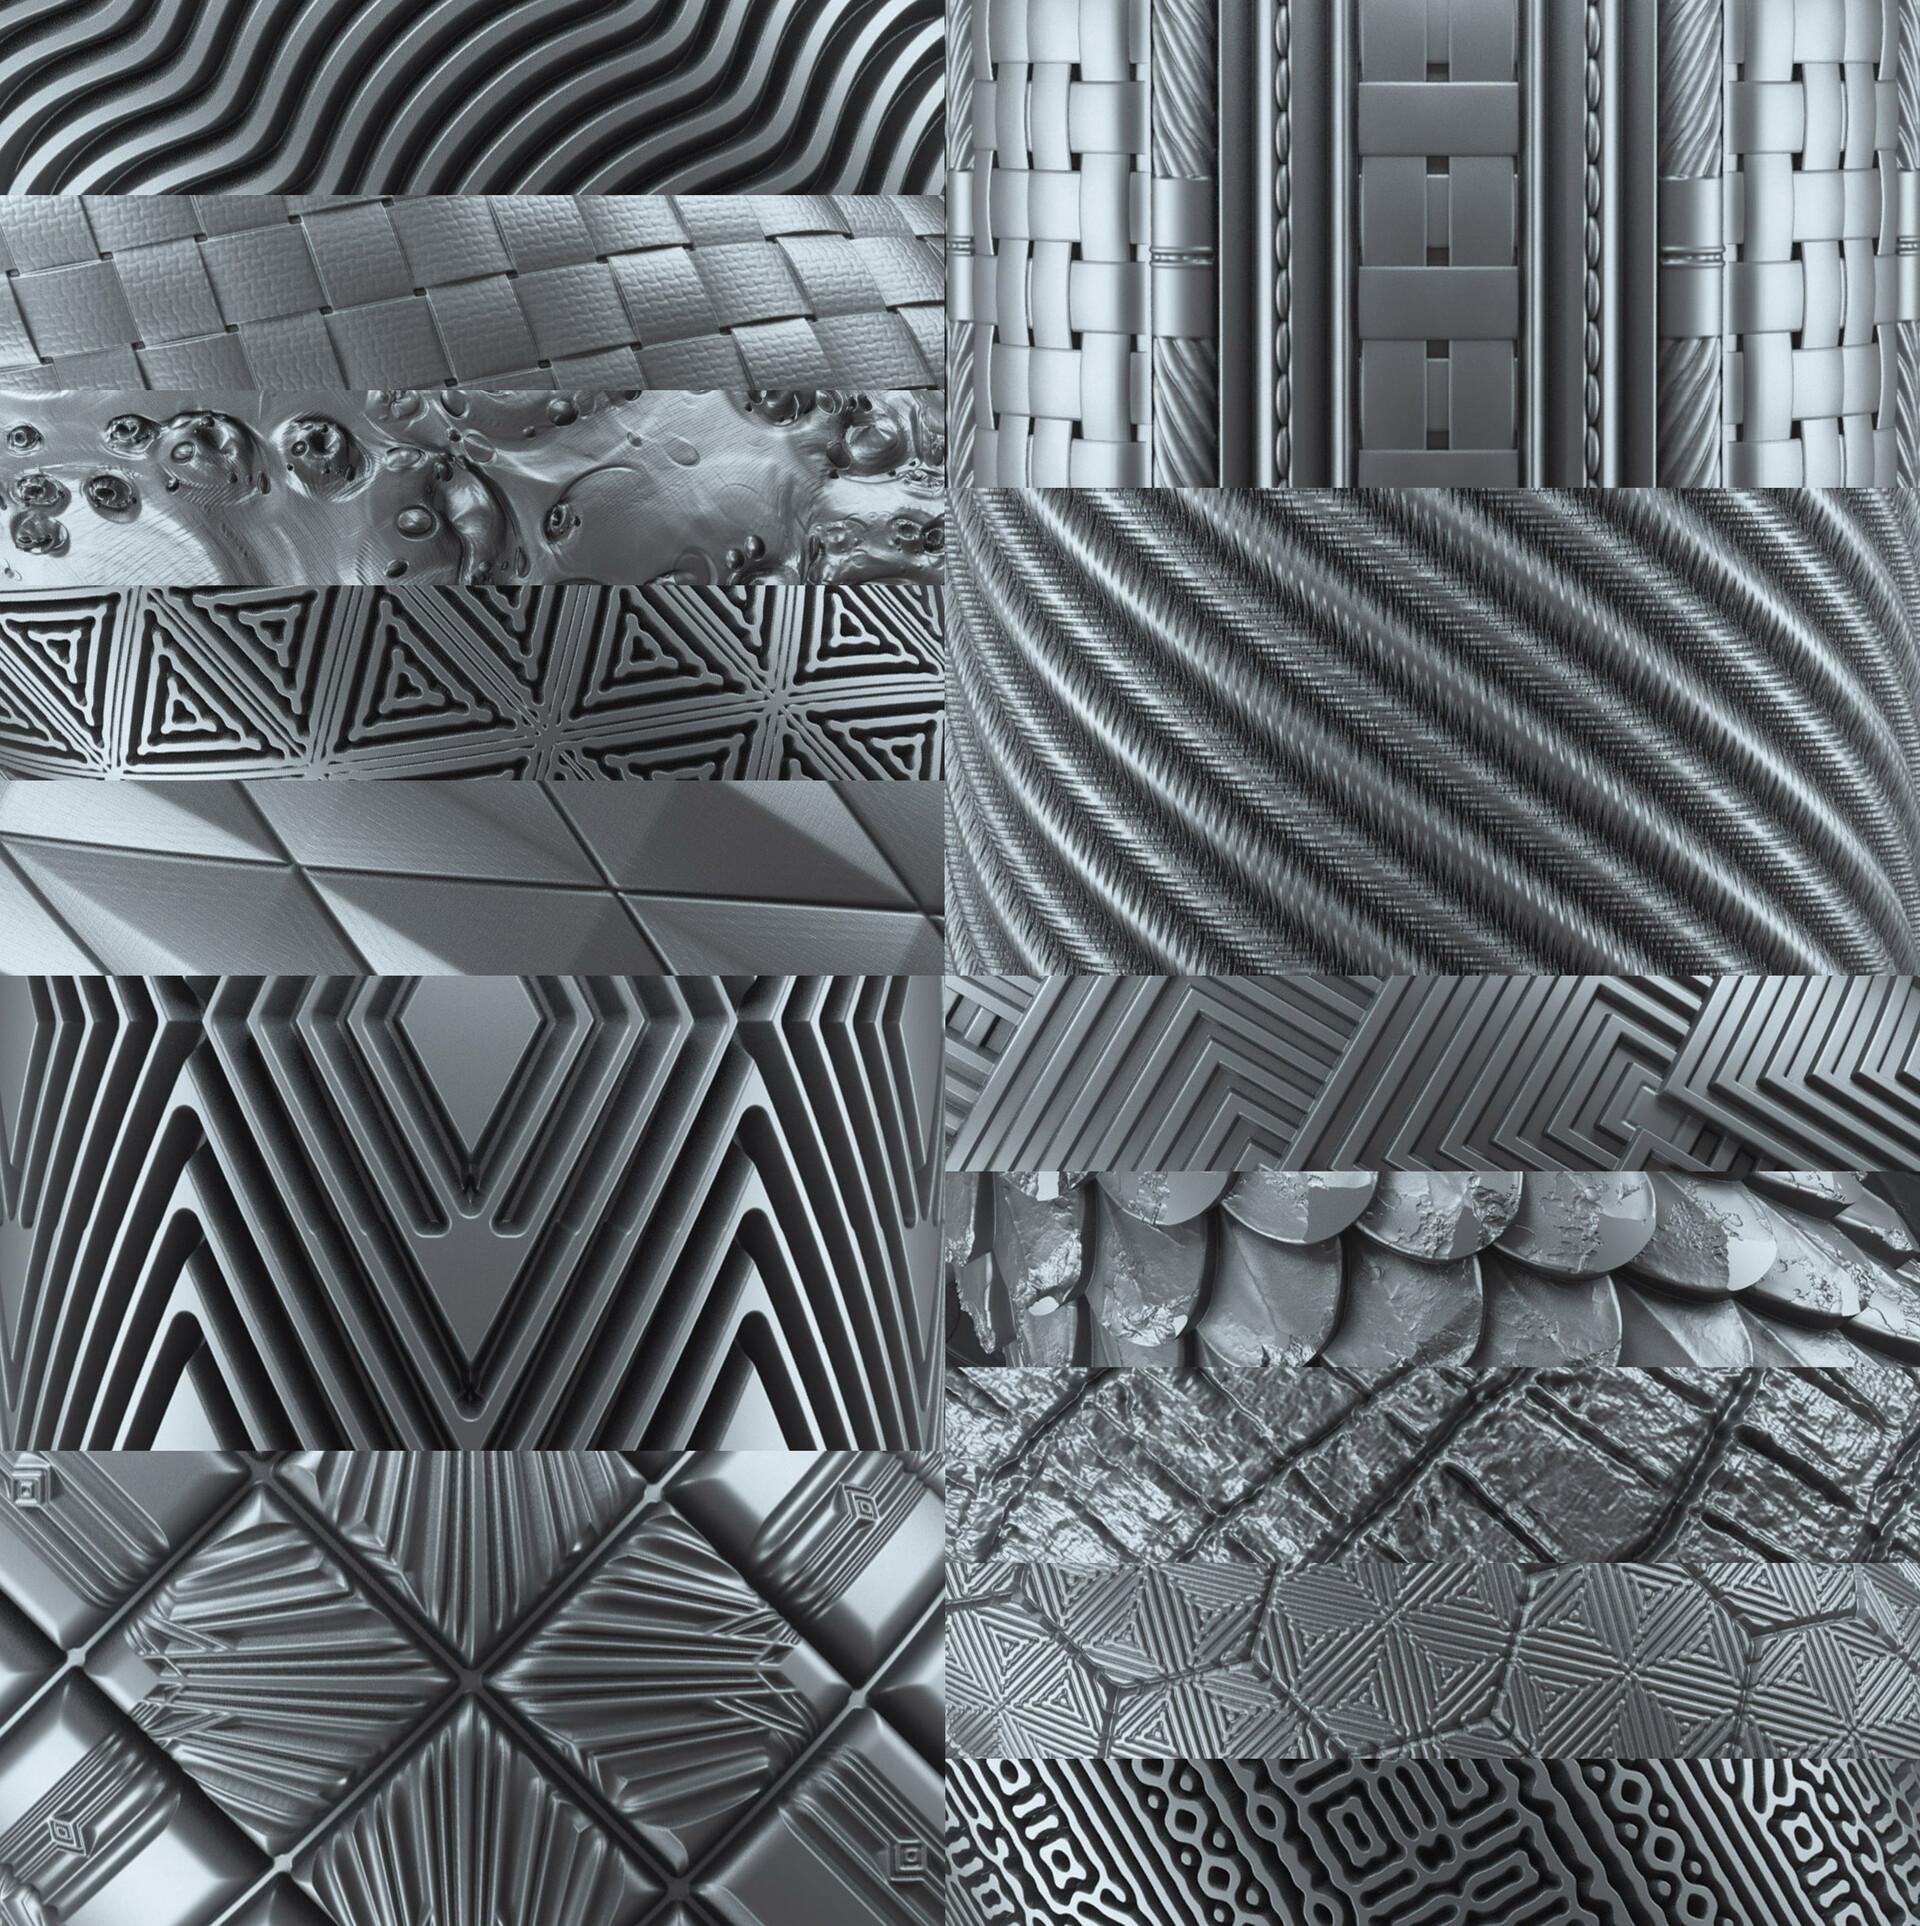 Travis davids 100 tileable displacement patterns part 2 preview5